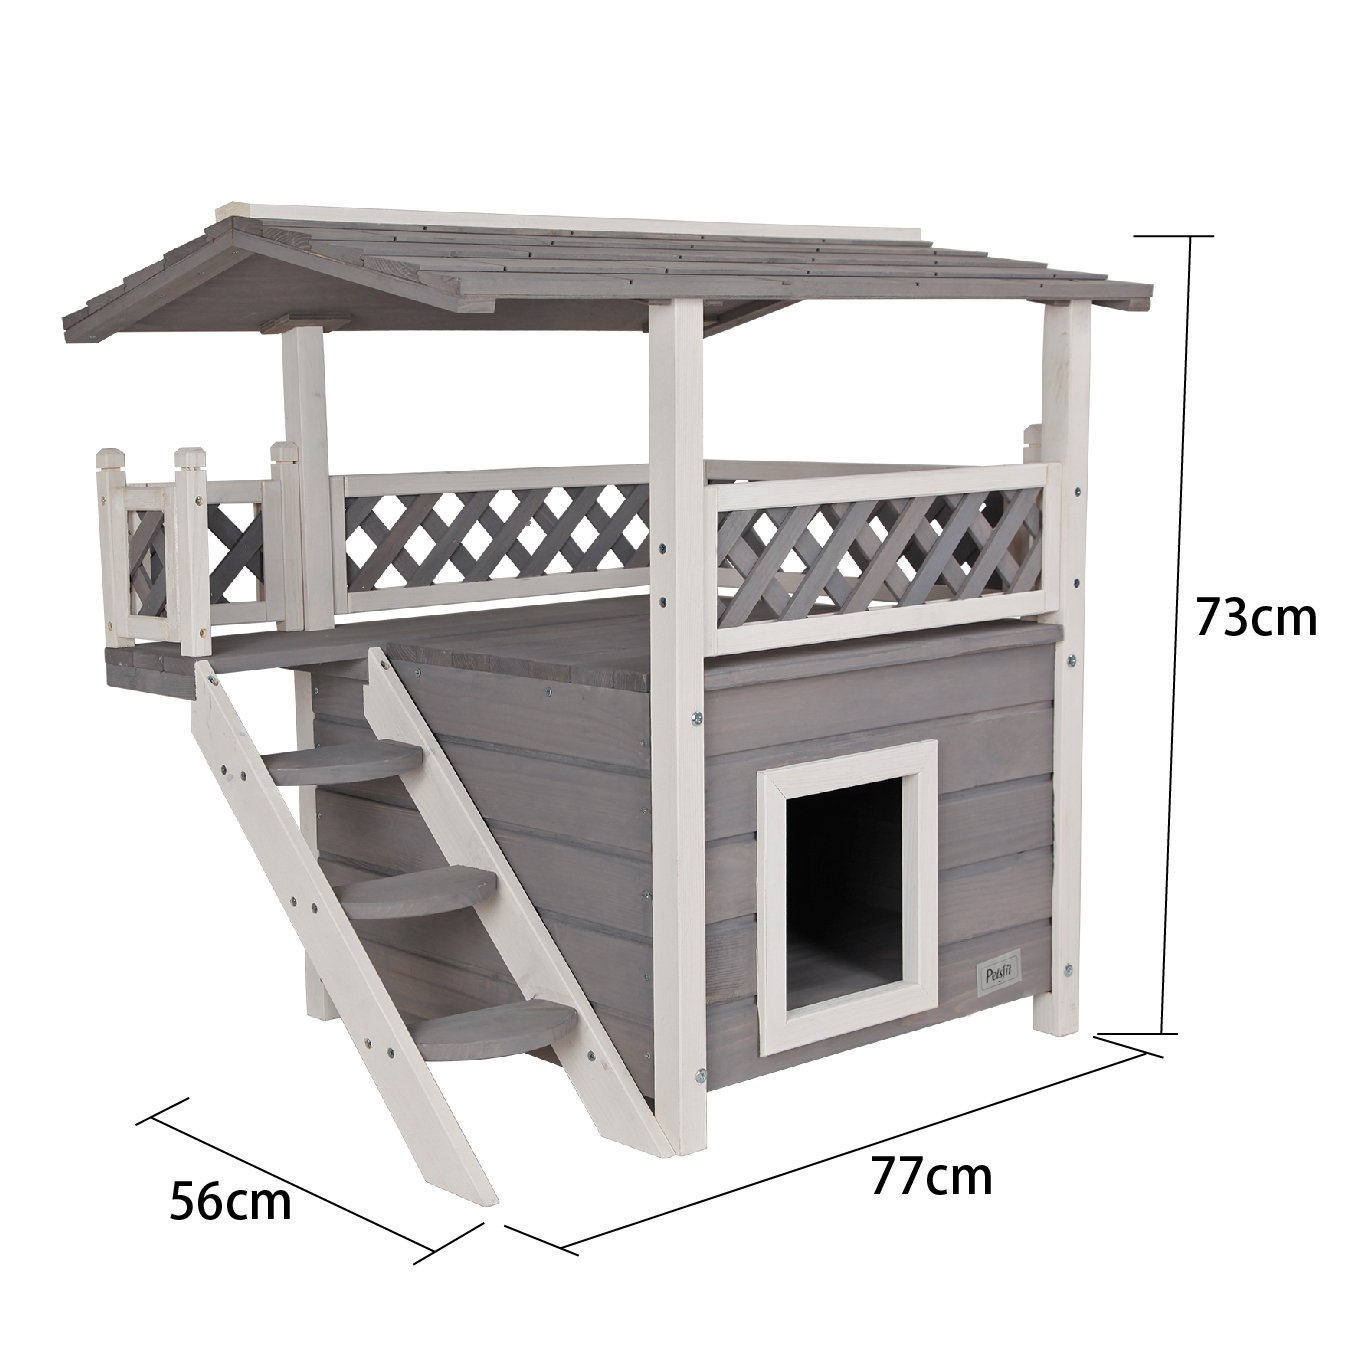 Petsfit Cat House Lodge, Casa de madera de madera para interiores con lugar de descanso, casa de gato de dos pisos, color gris, 77 cm x 56 cm x 73 cm: ...